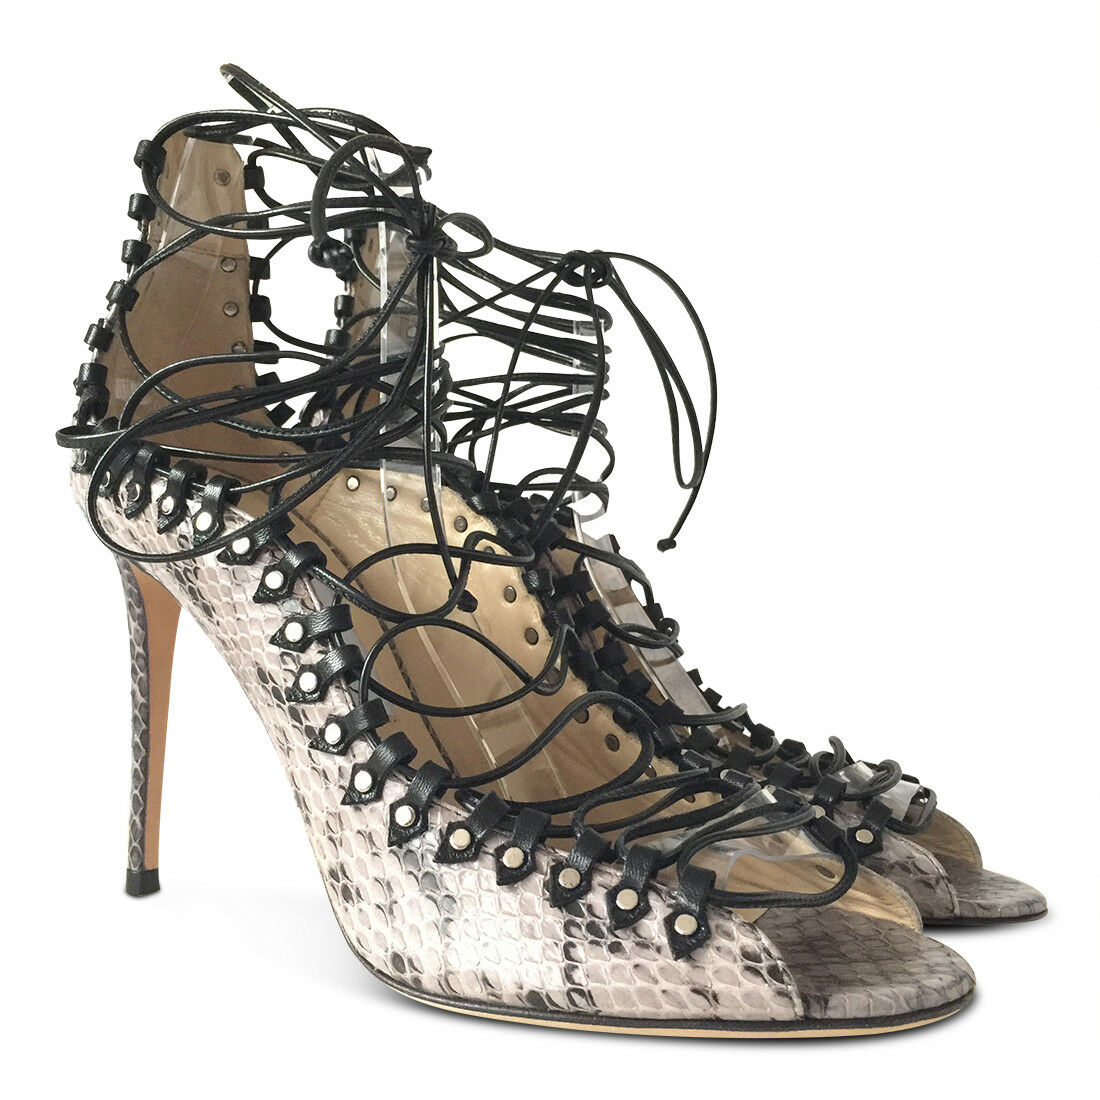 NUOVO   1799 JMMY CHO Koko Snakeskin Lace -Up Heels - grigio - Dimensione 39.5  ecco l'ultimo